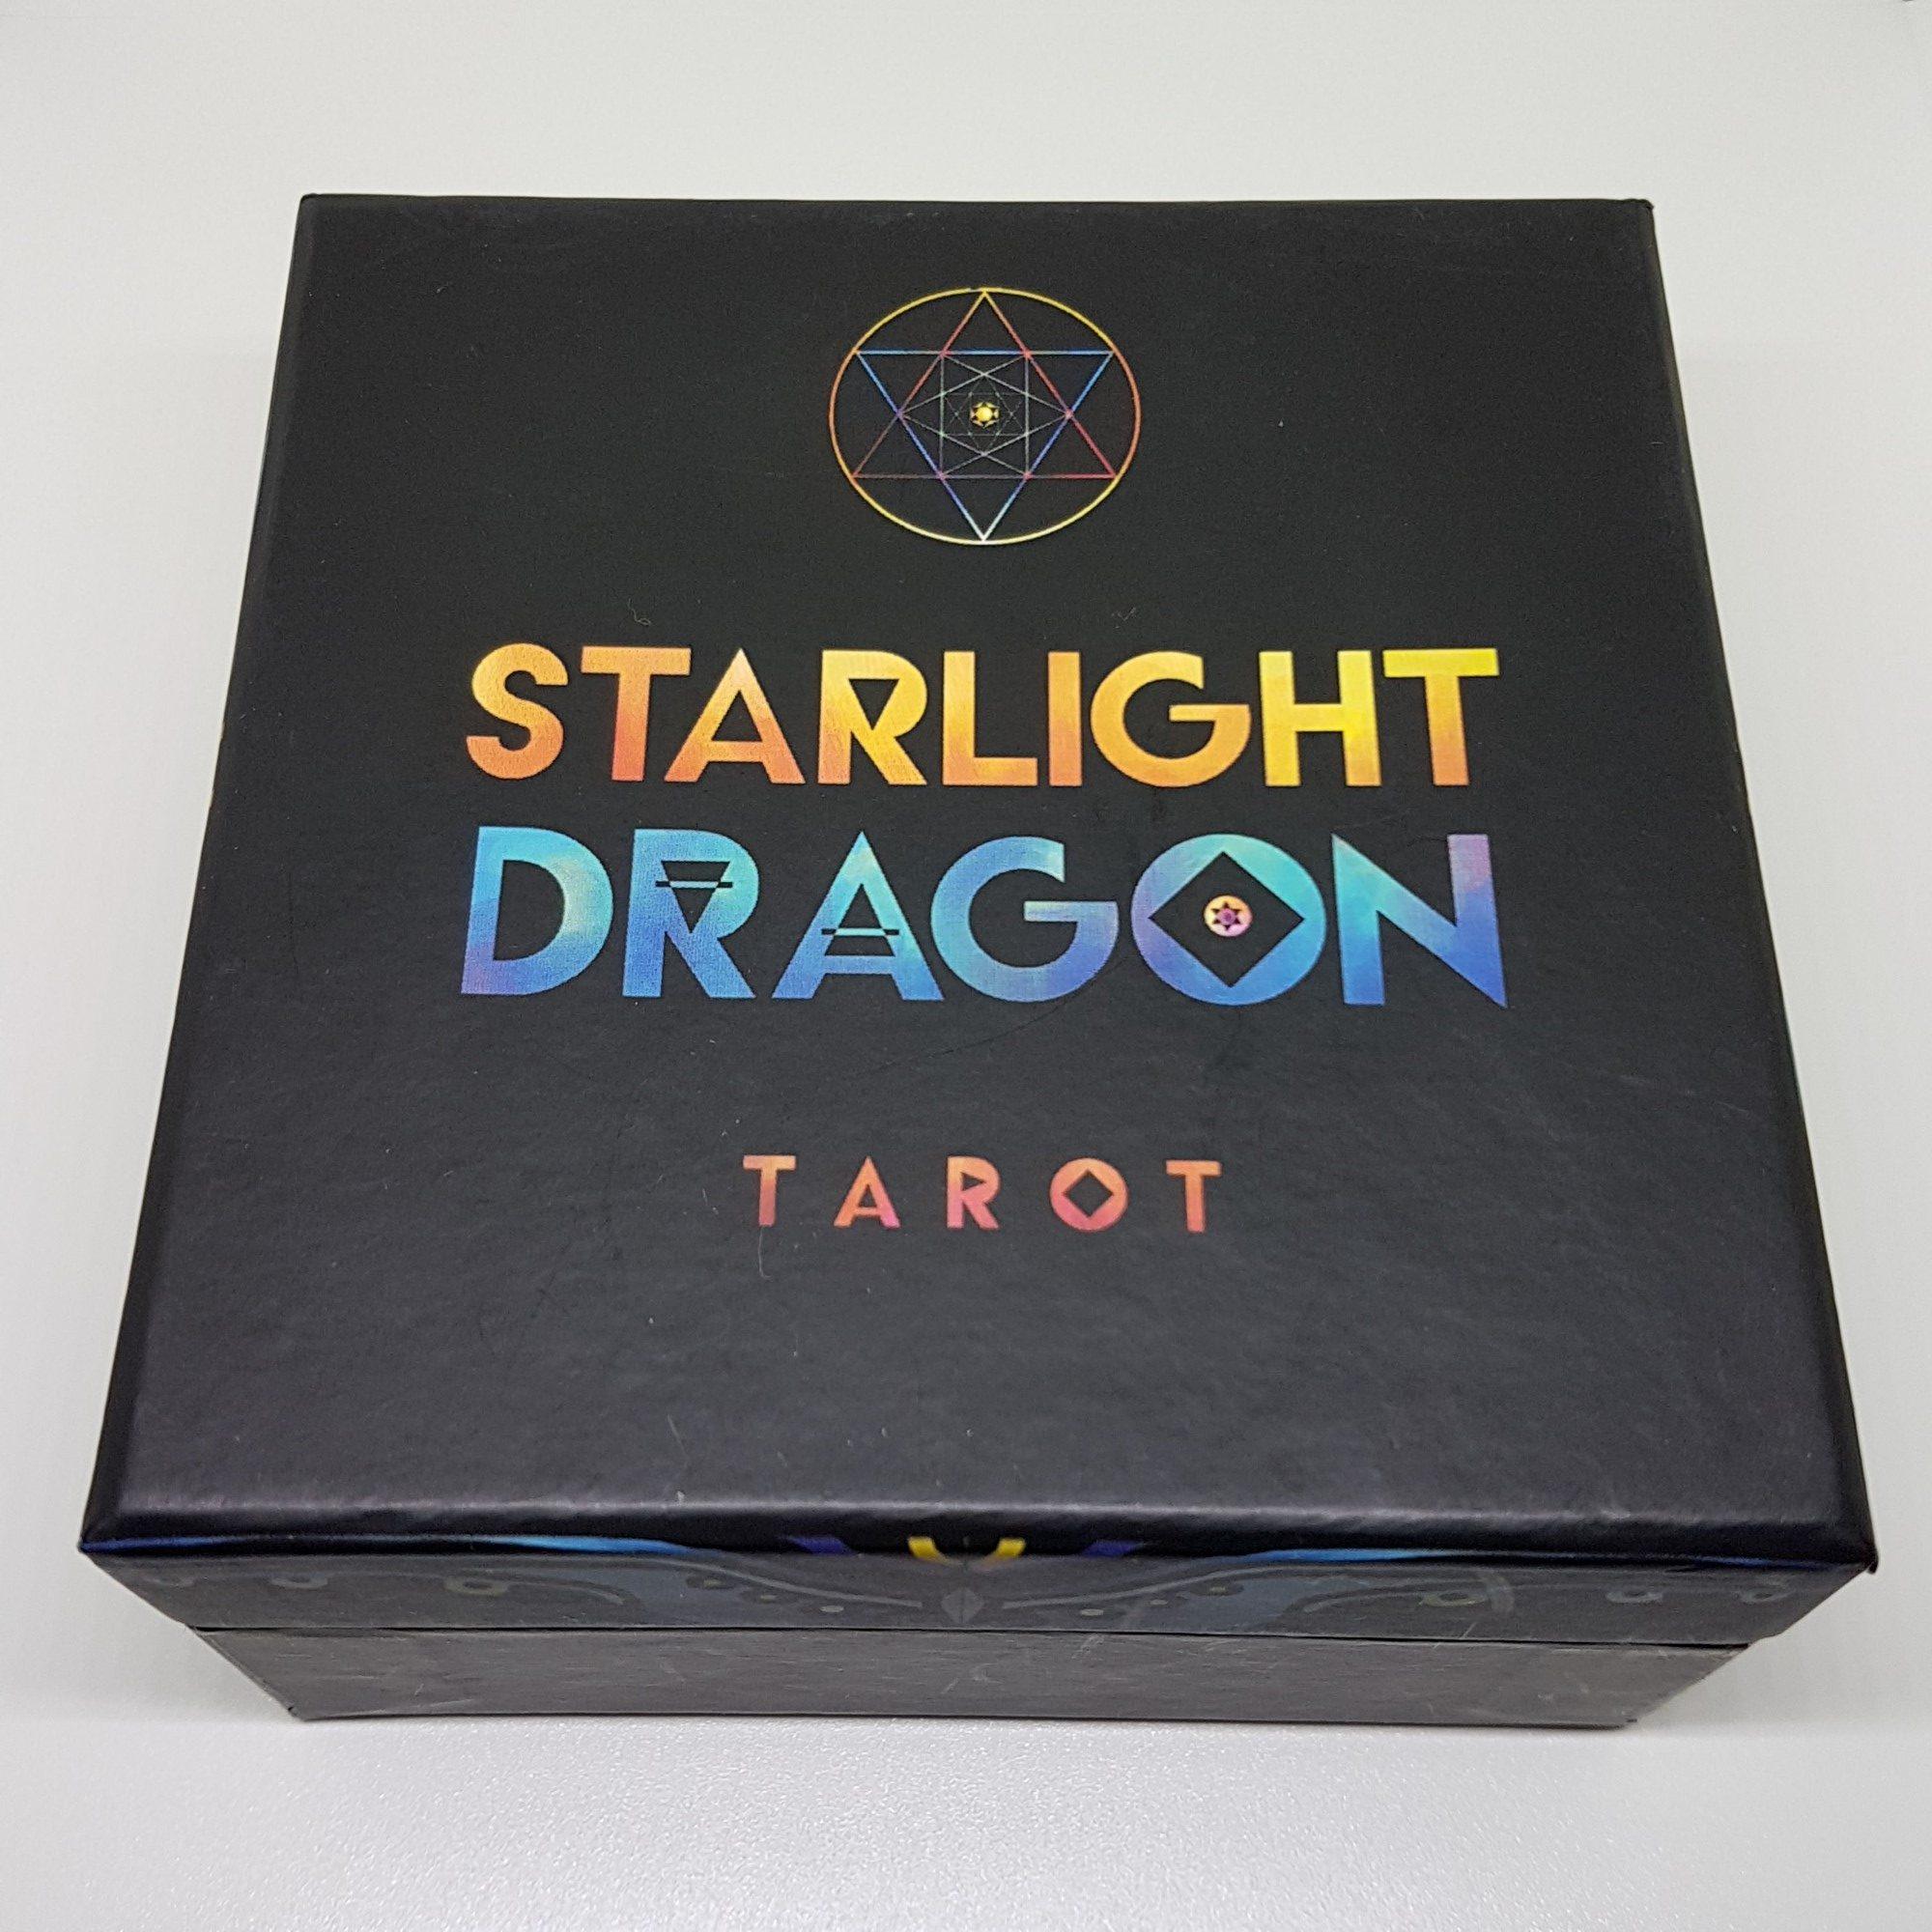 Starlight Dragon Tarot Sale Off 2